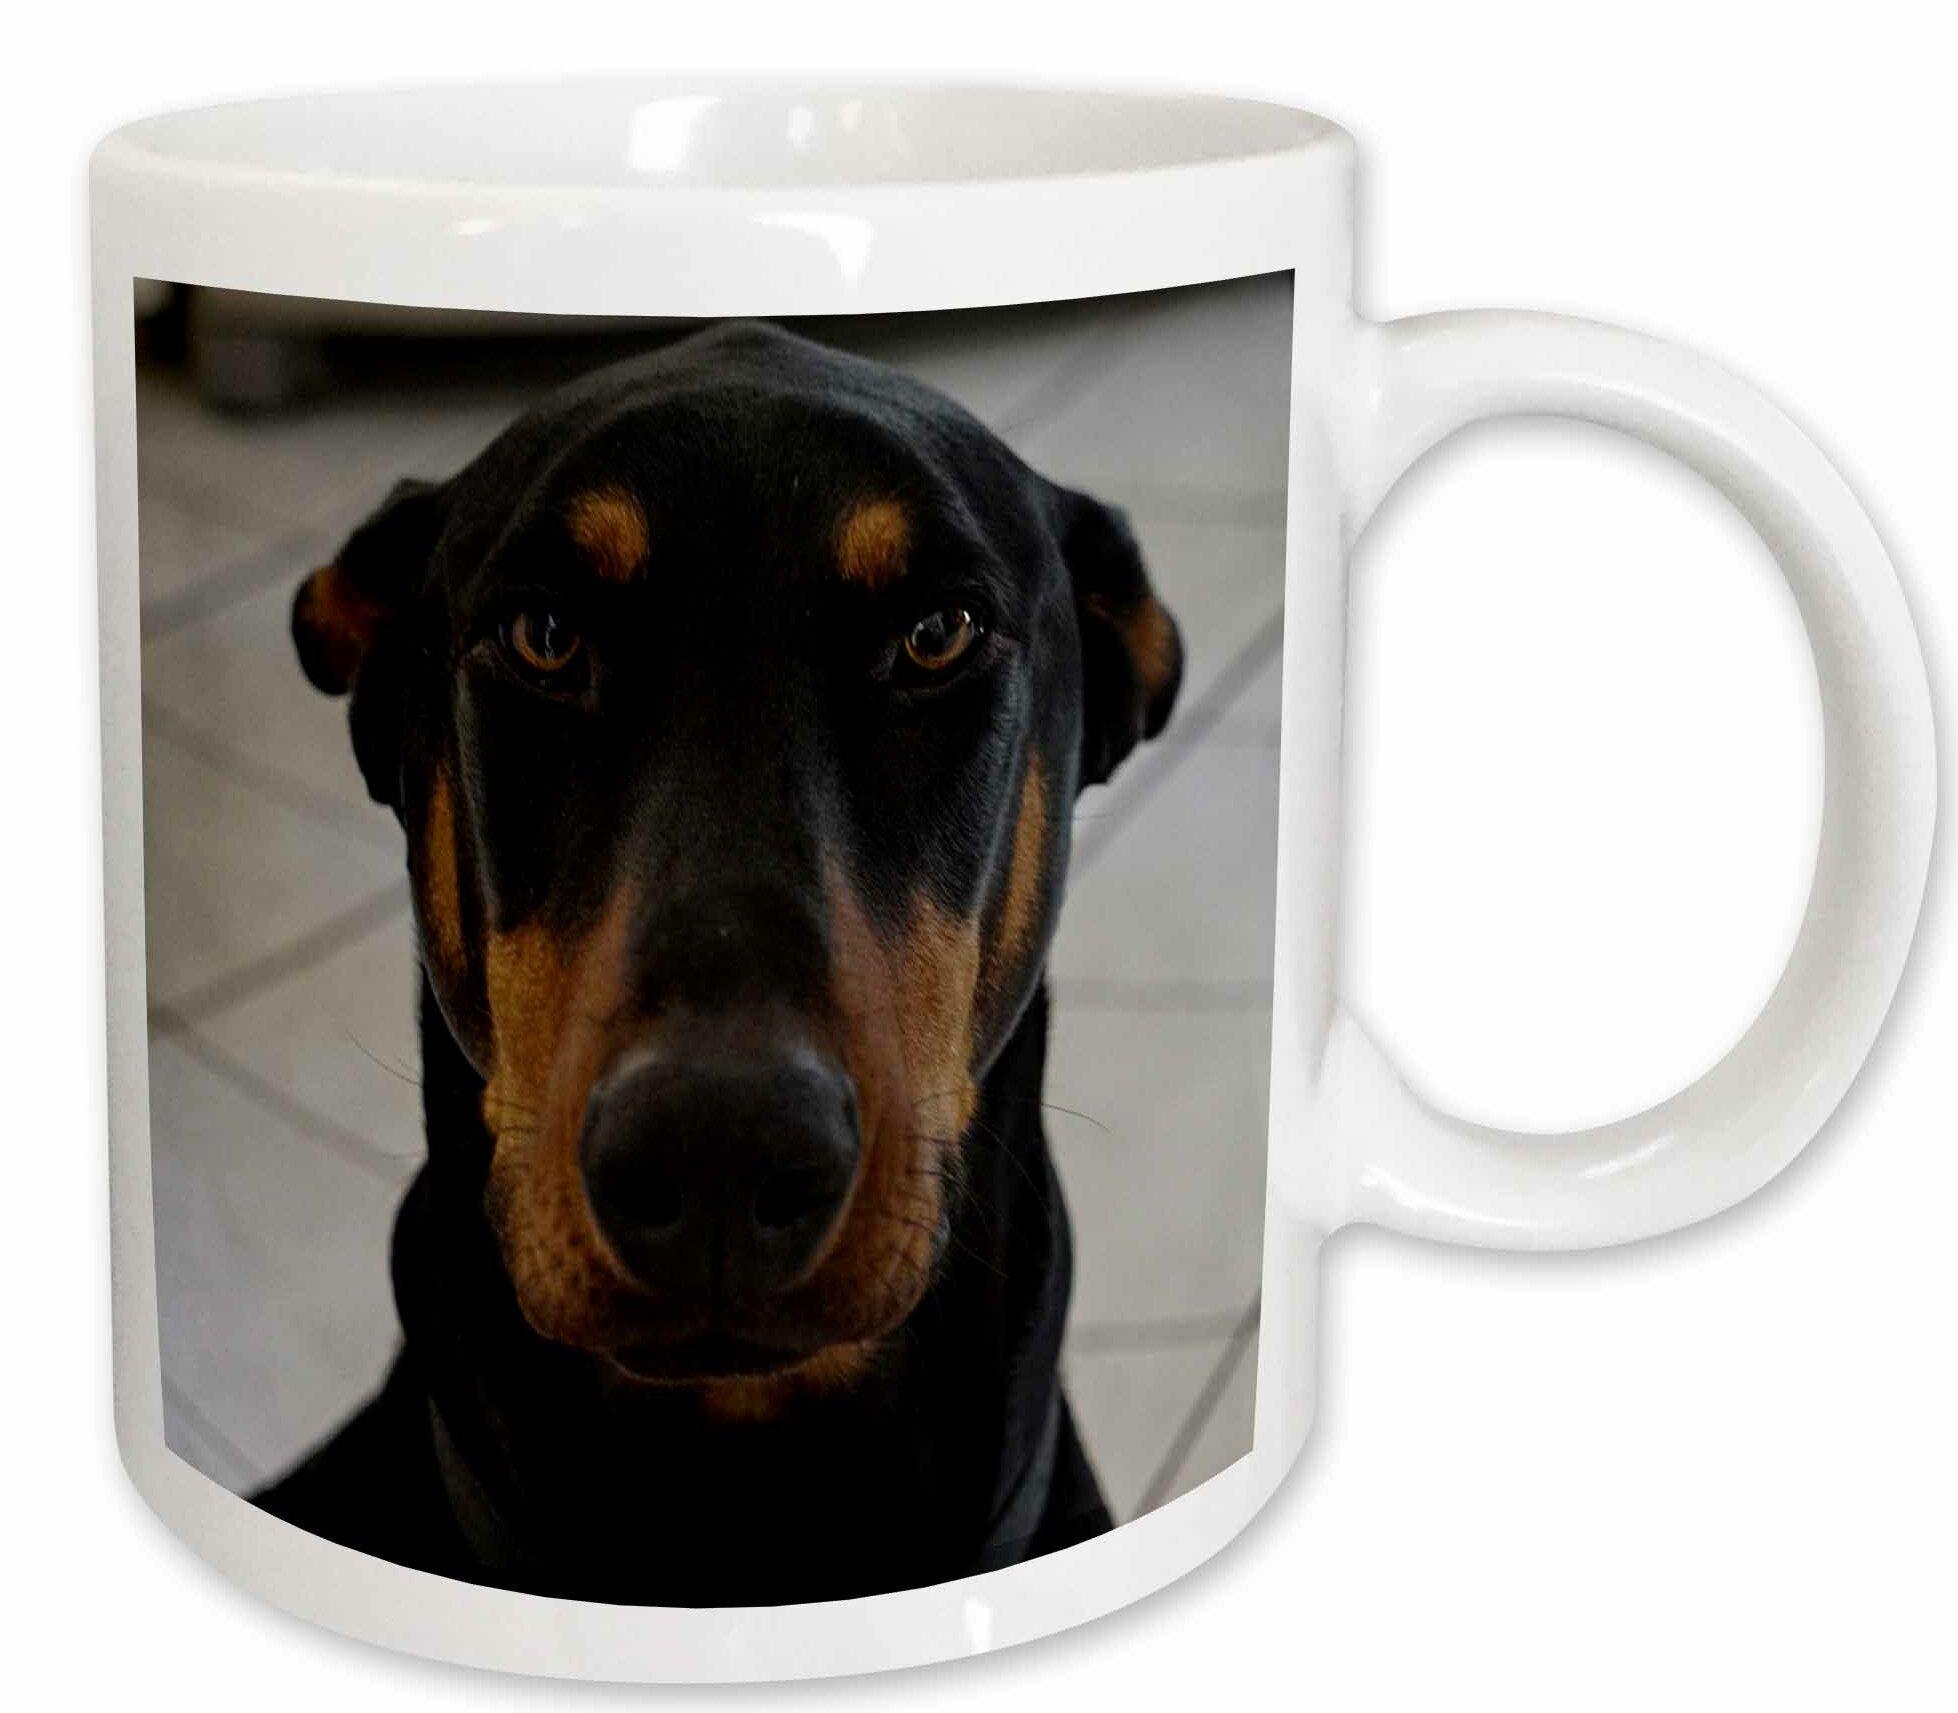 3drose Doberman Coffee Mug Wayfair